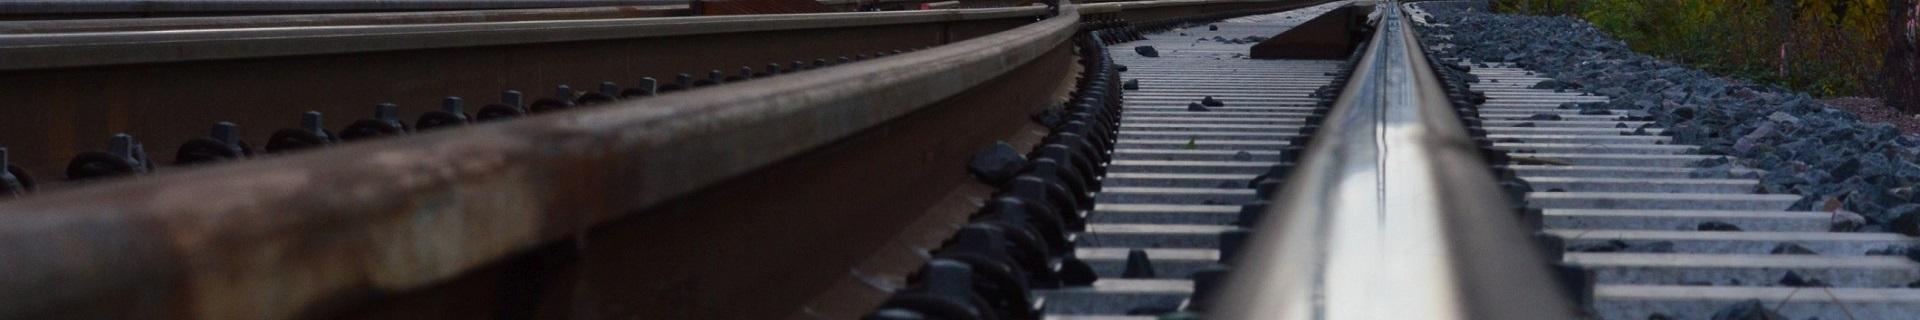 gebogene Schiene, Bahntechnik, Bahnbetrieb,